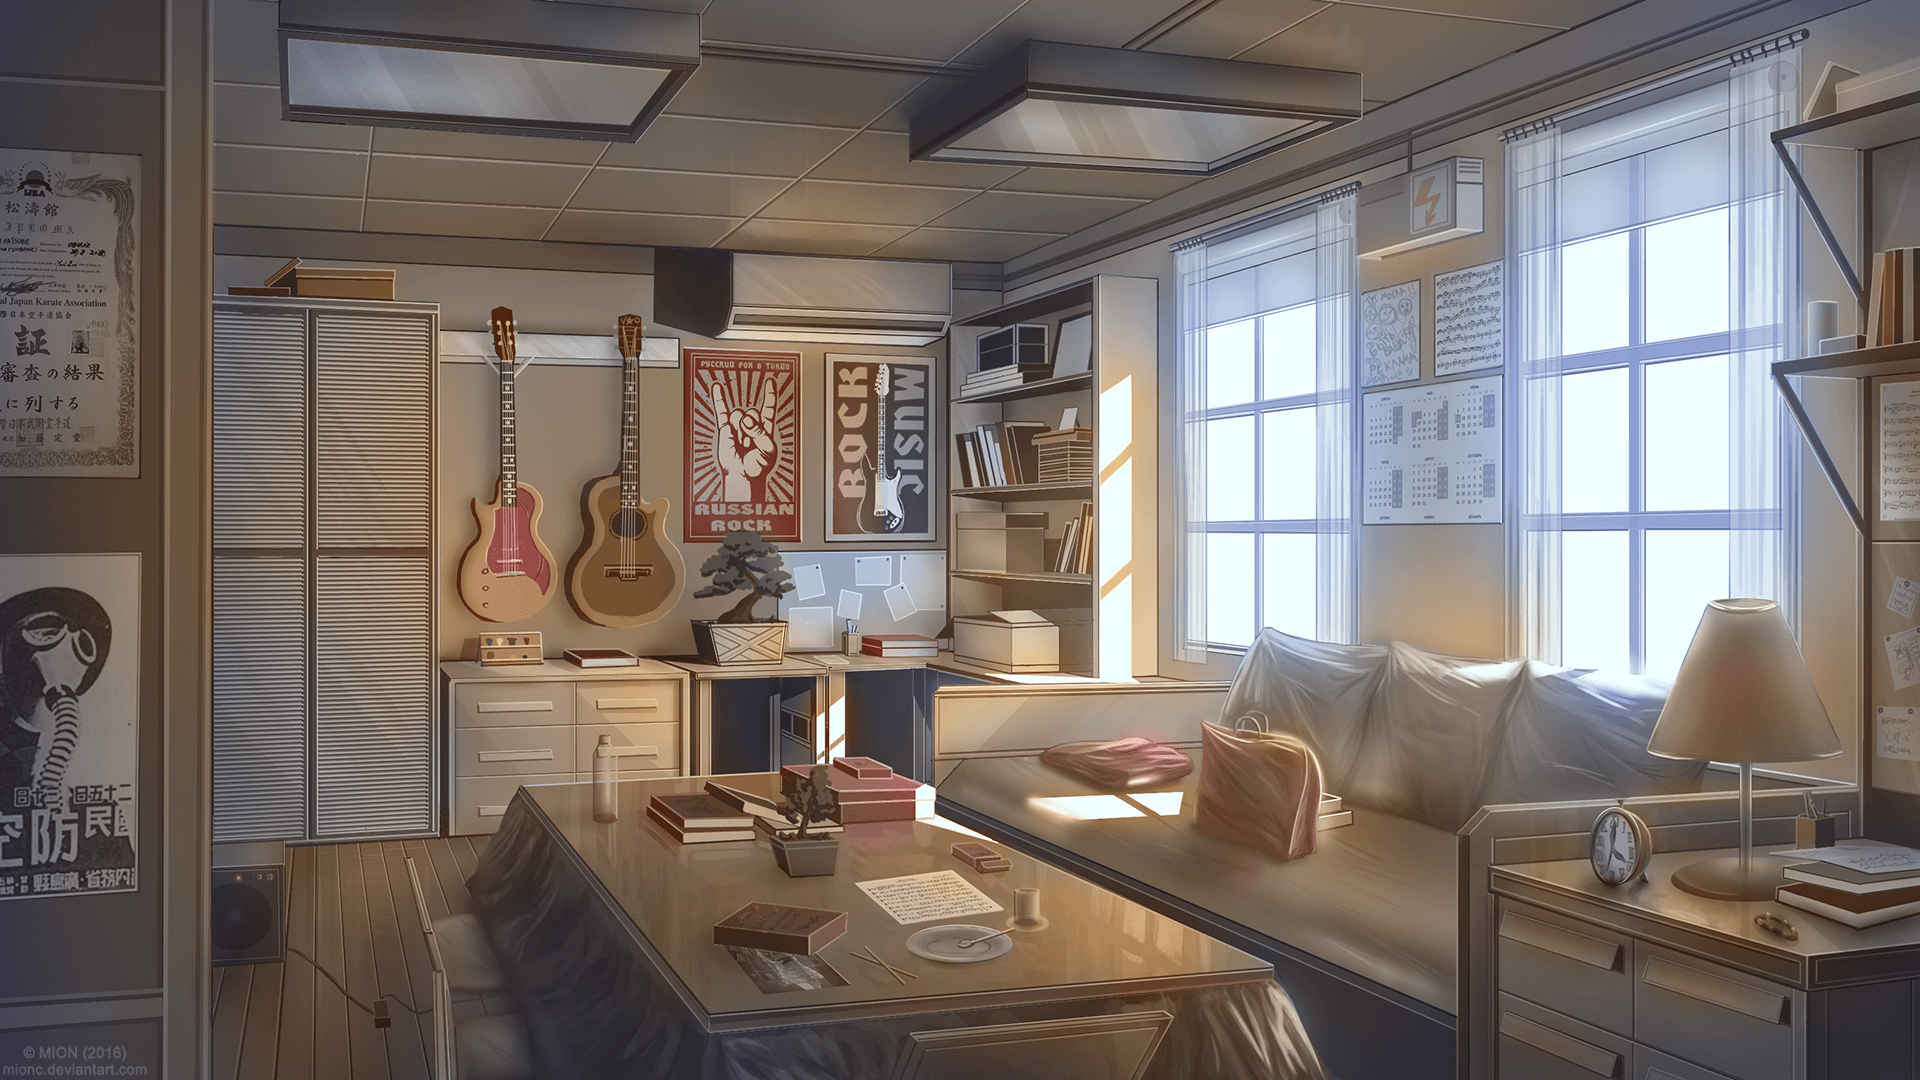 Anime Bedroom Wallpapers - Wallpaper Cave